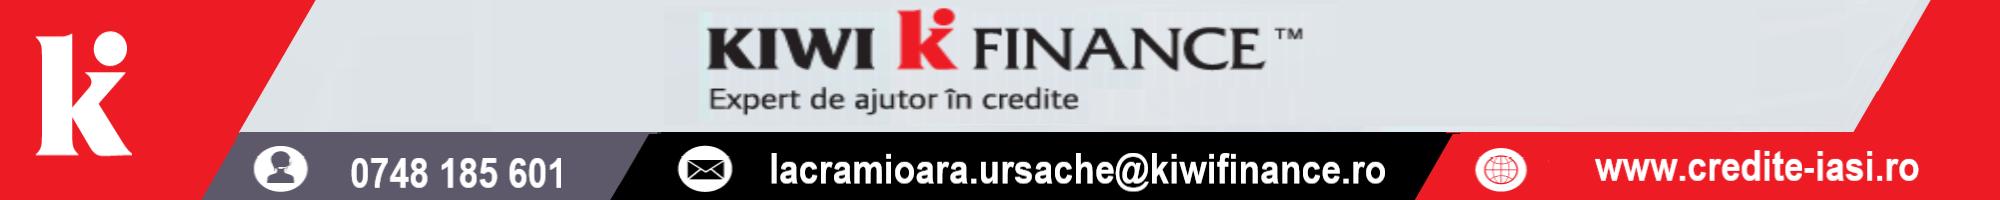 Kiwi Finance Iasi